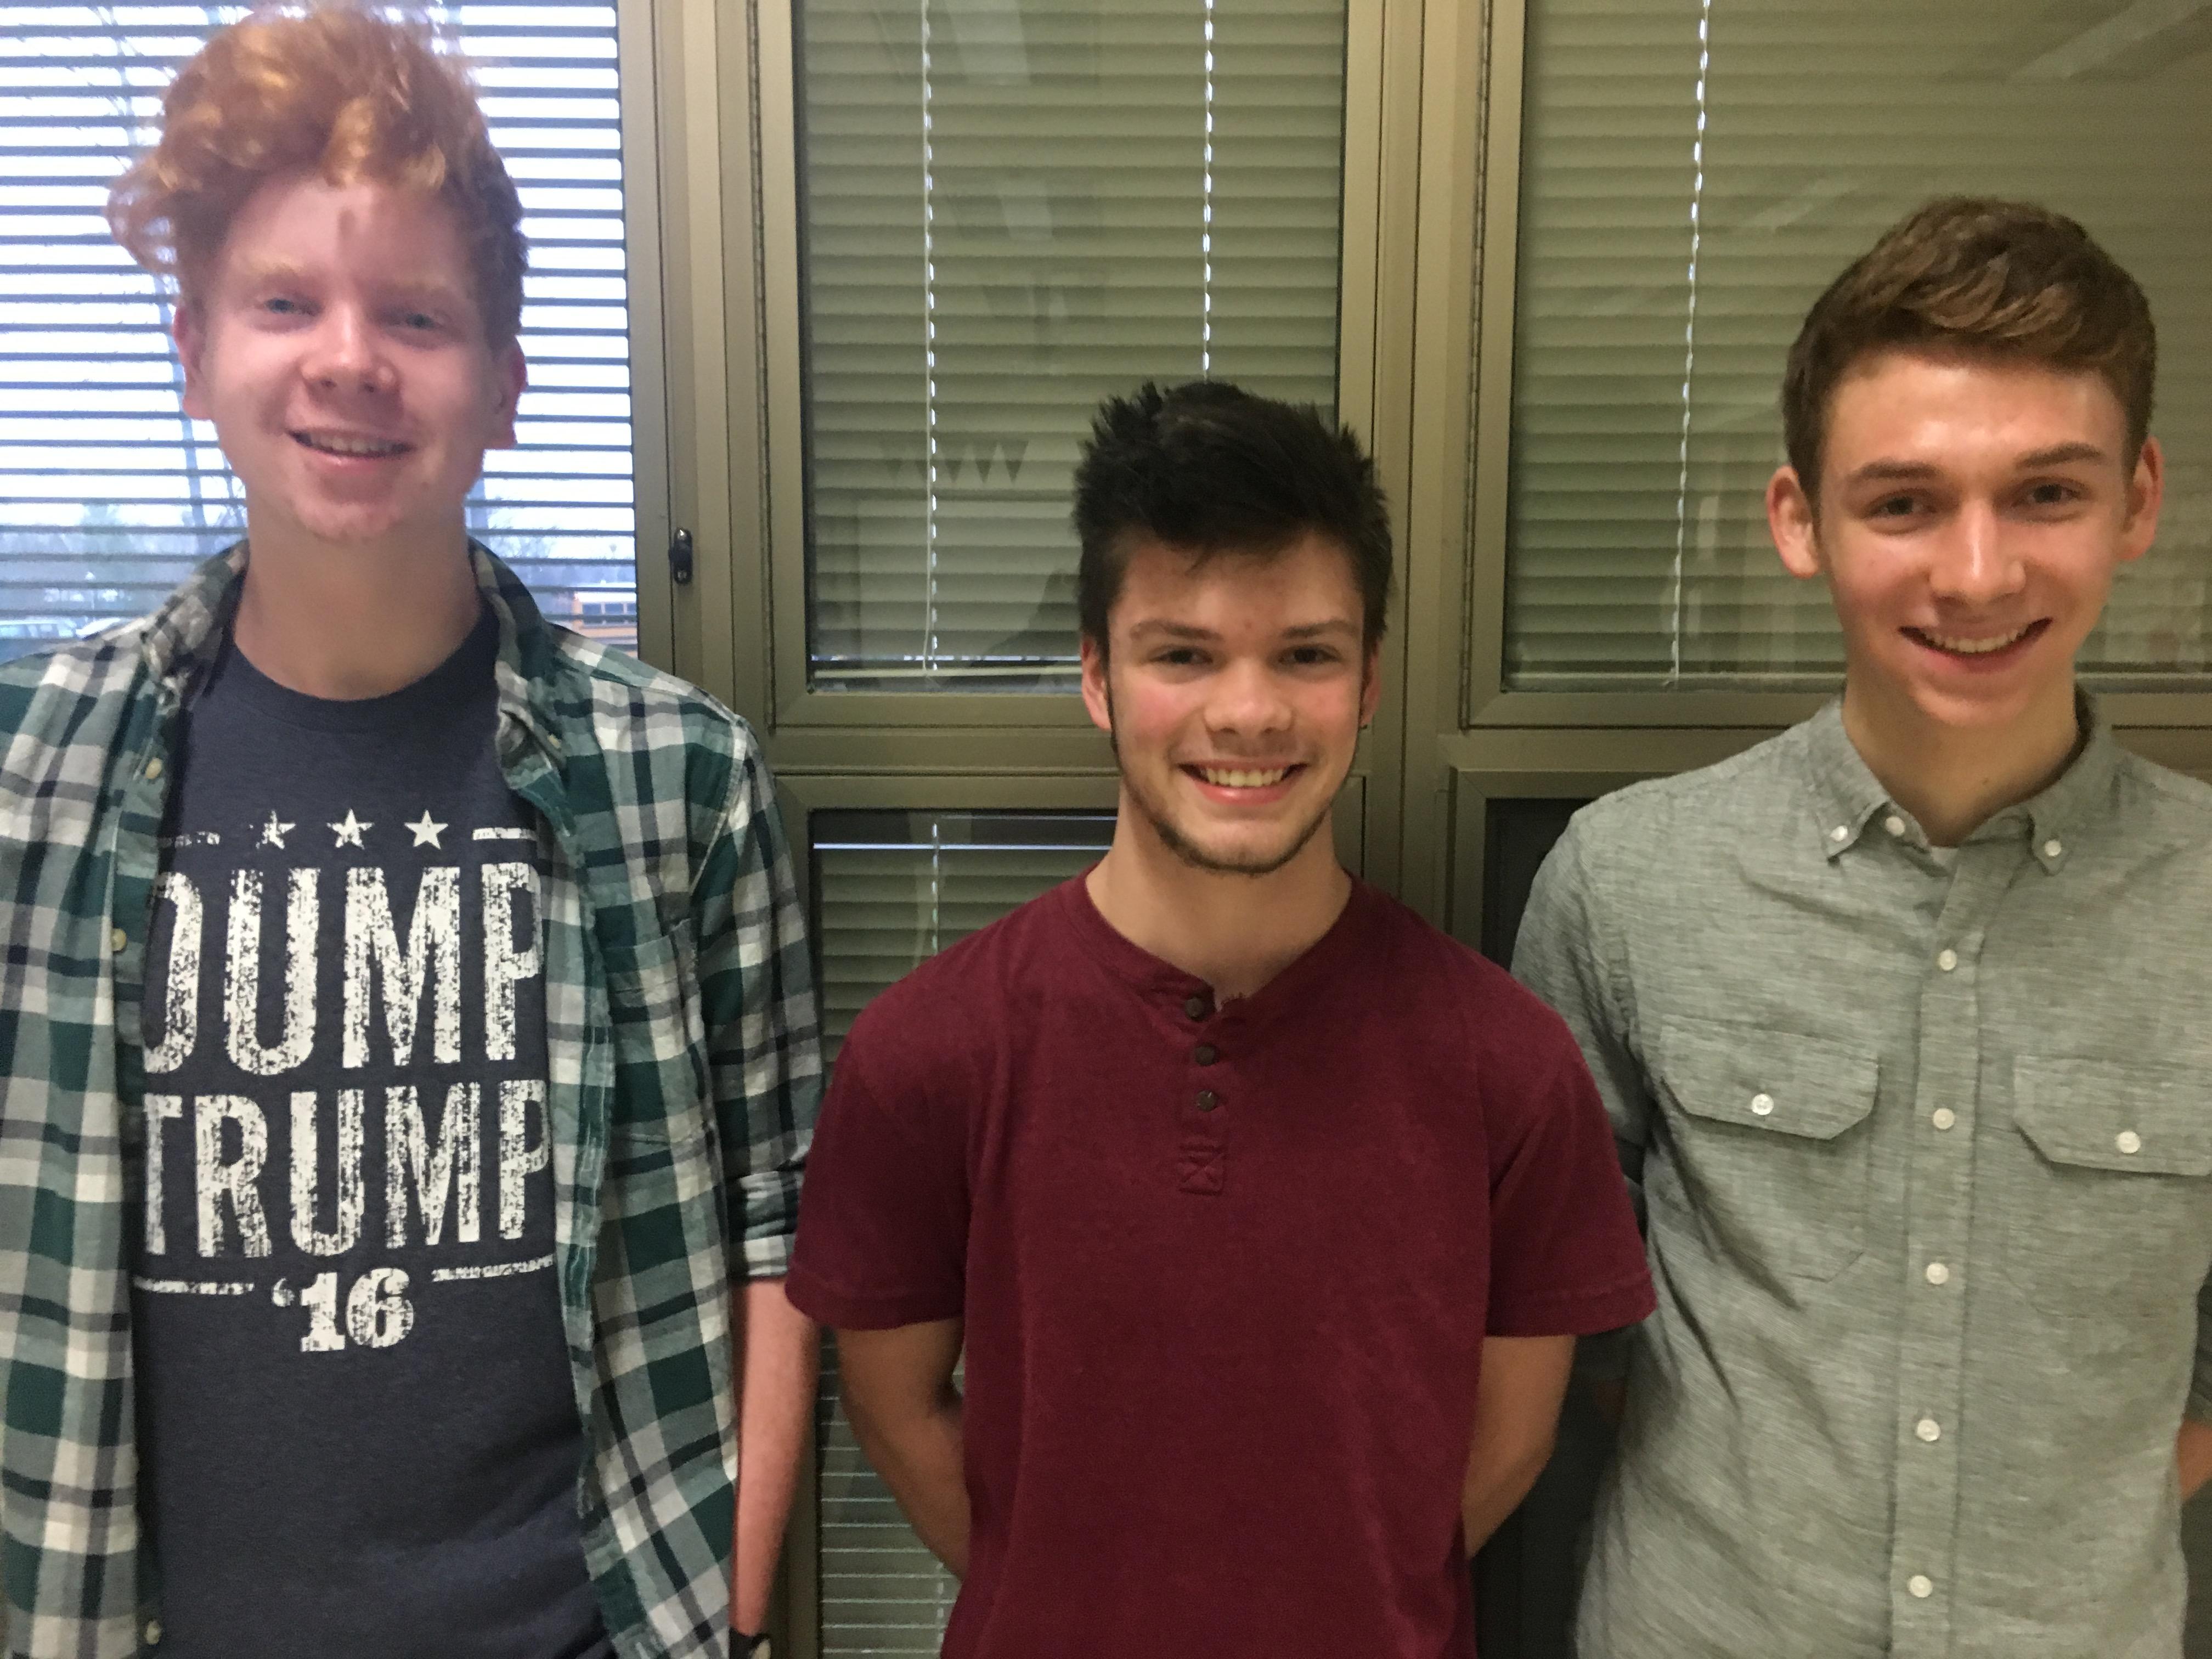 Highland High School Dylan Cox, Larkin Cleland, Benjamin Lewton